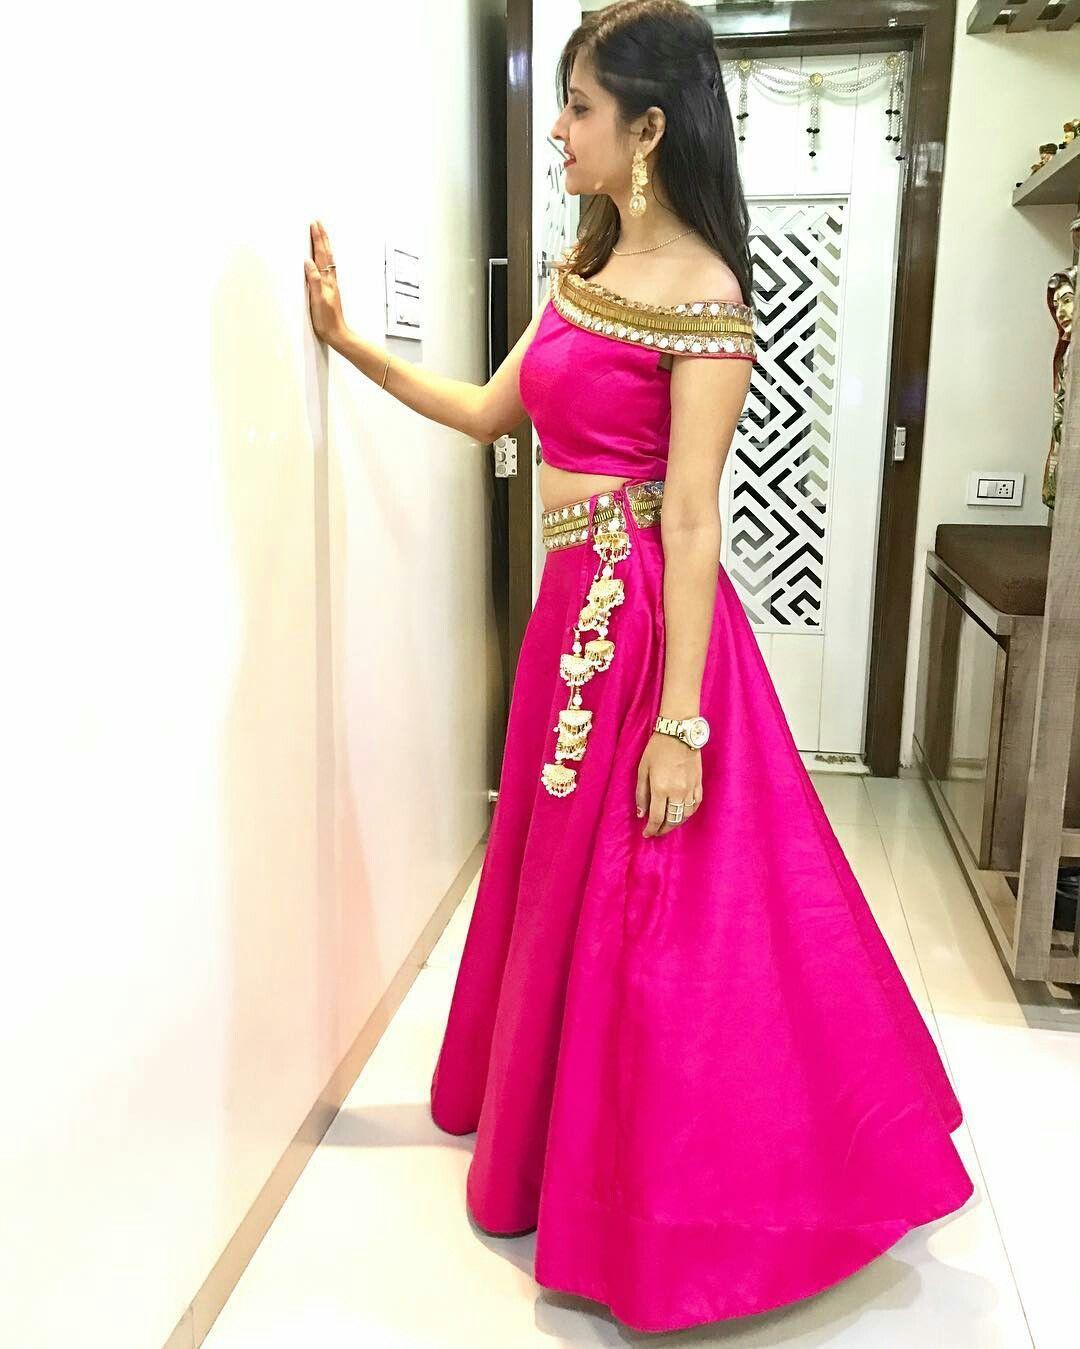 Pin de Shiffa Bansal en Indian outfits. | Pinterest